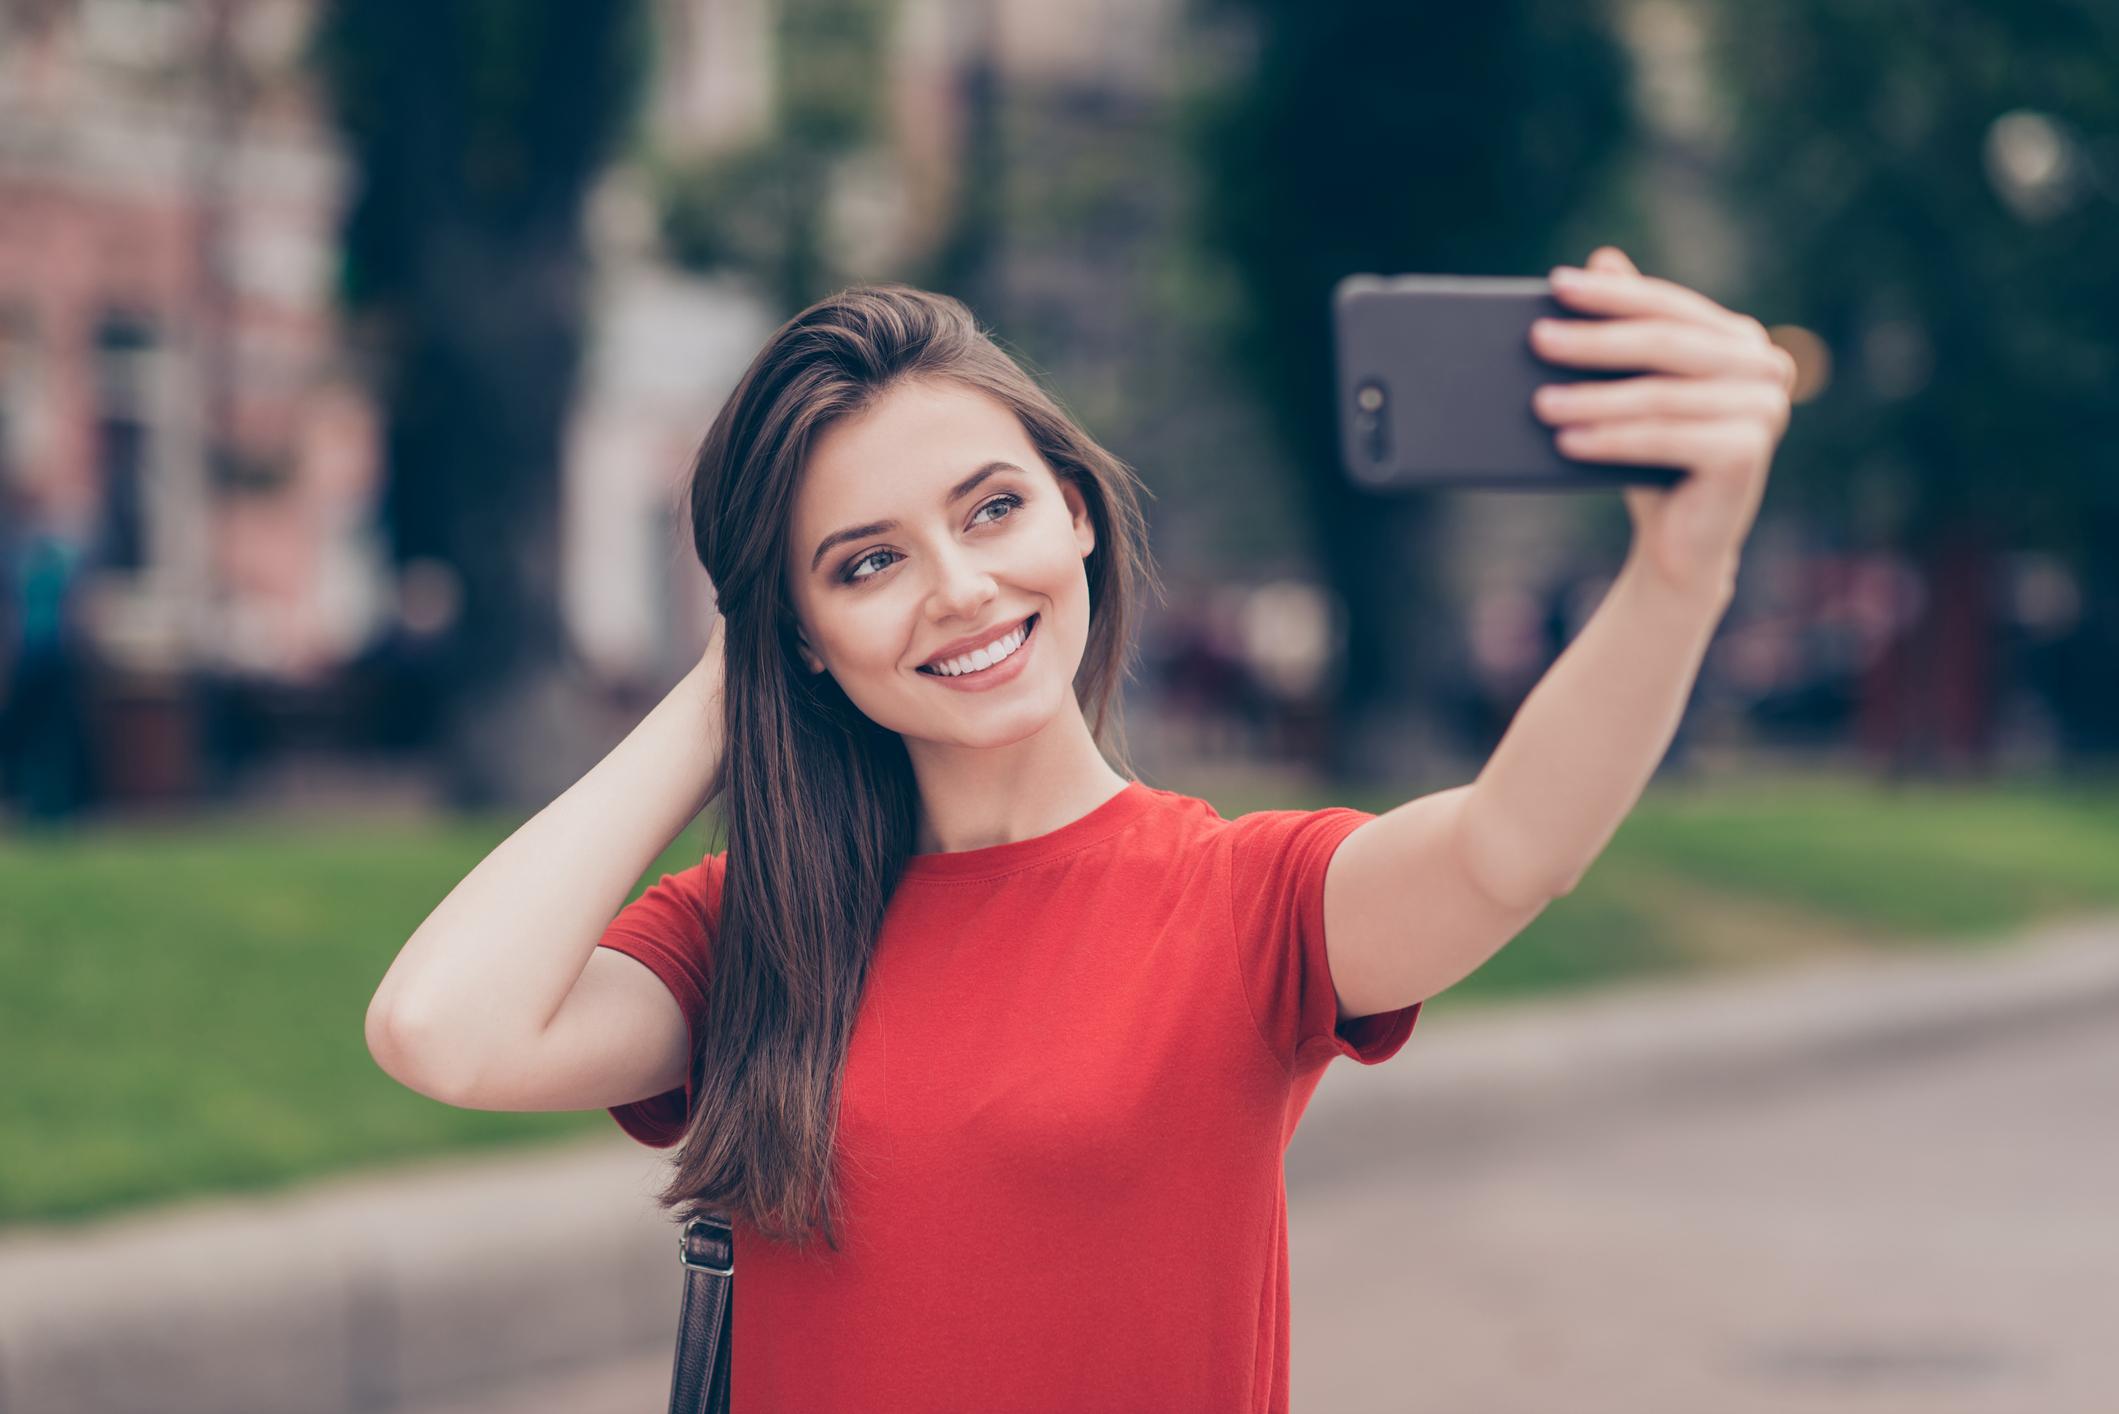 Junge Influencerin macht Selfie